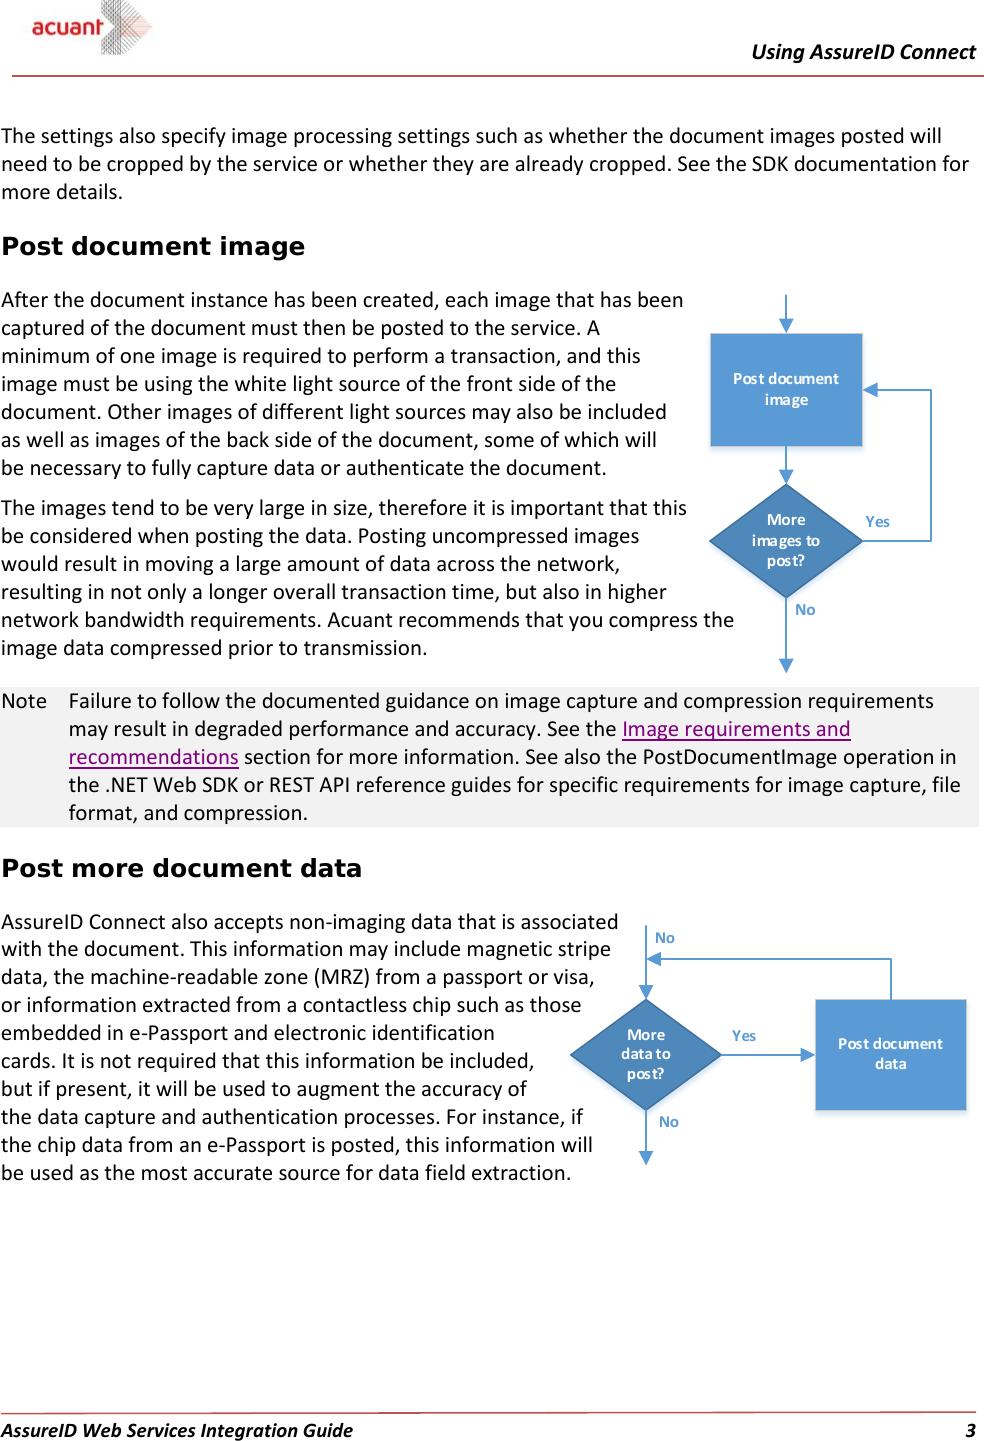 Assure ID Connect Web Service Integration Guide